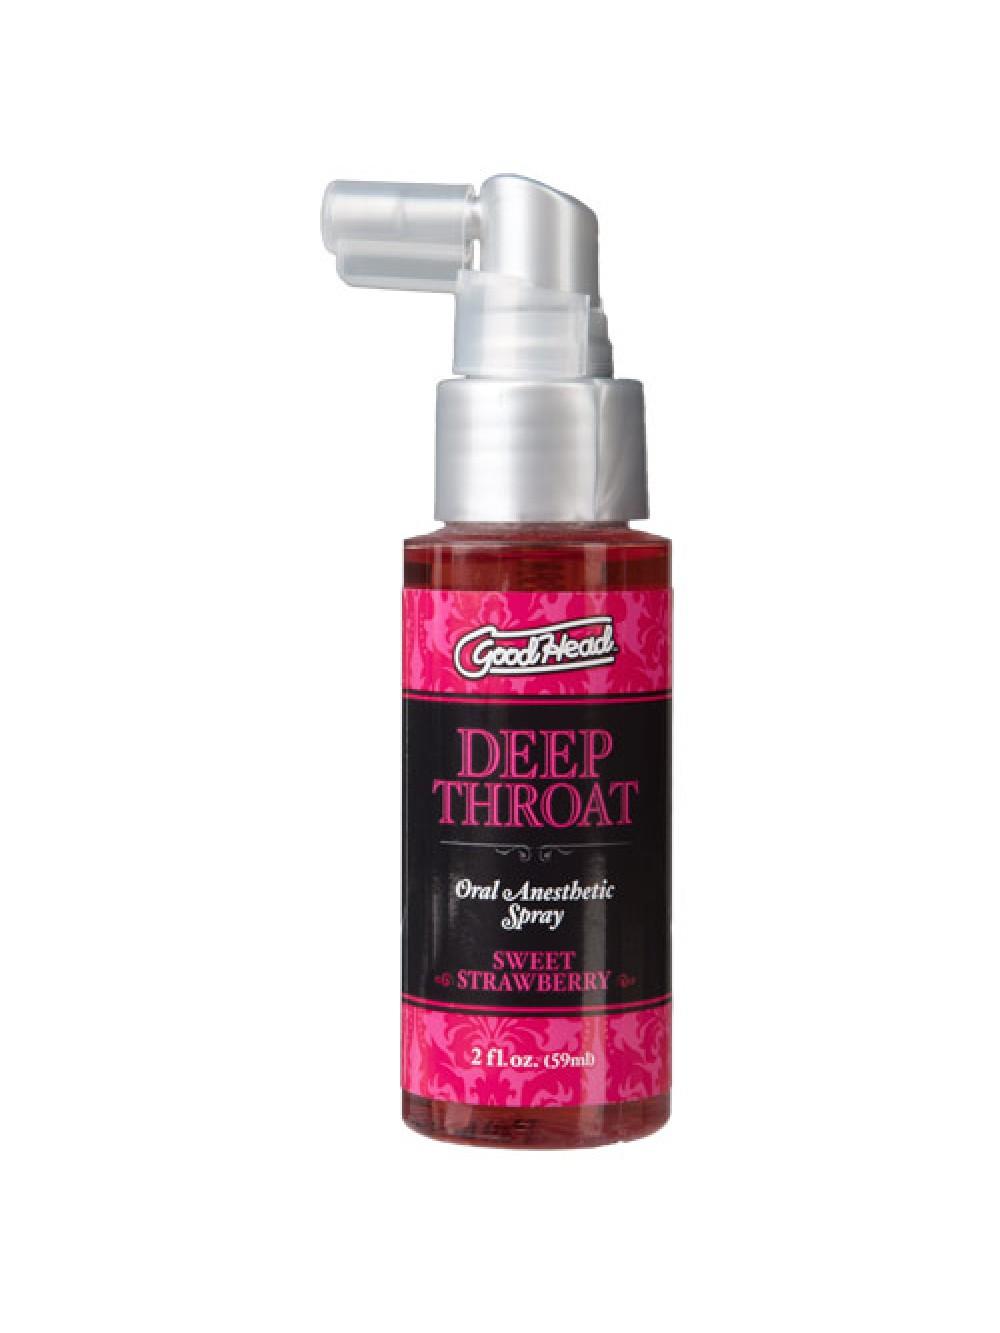 Good Head Deep Throat Spray Strawberry